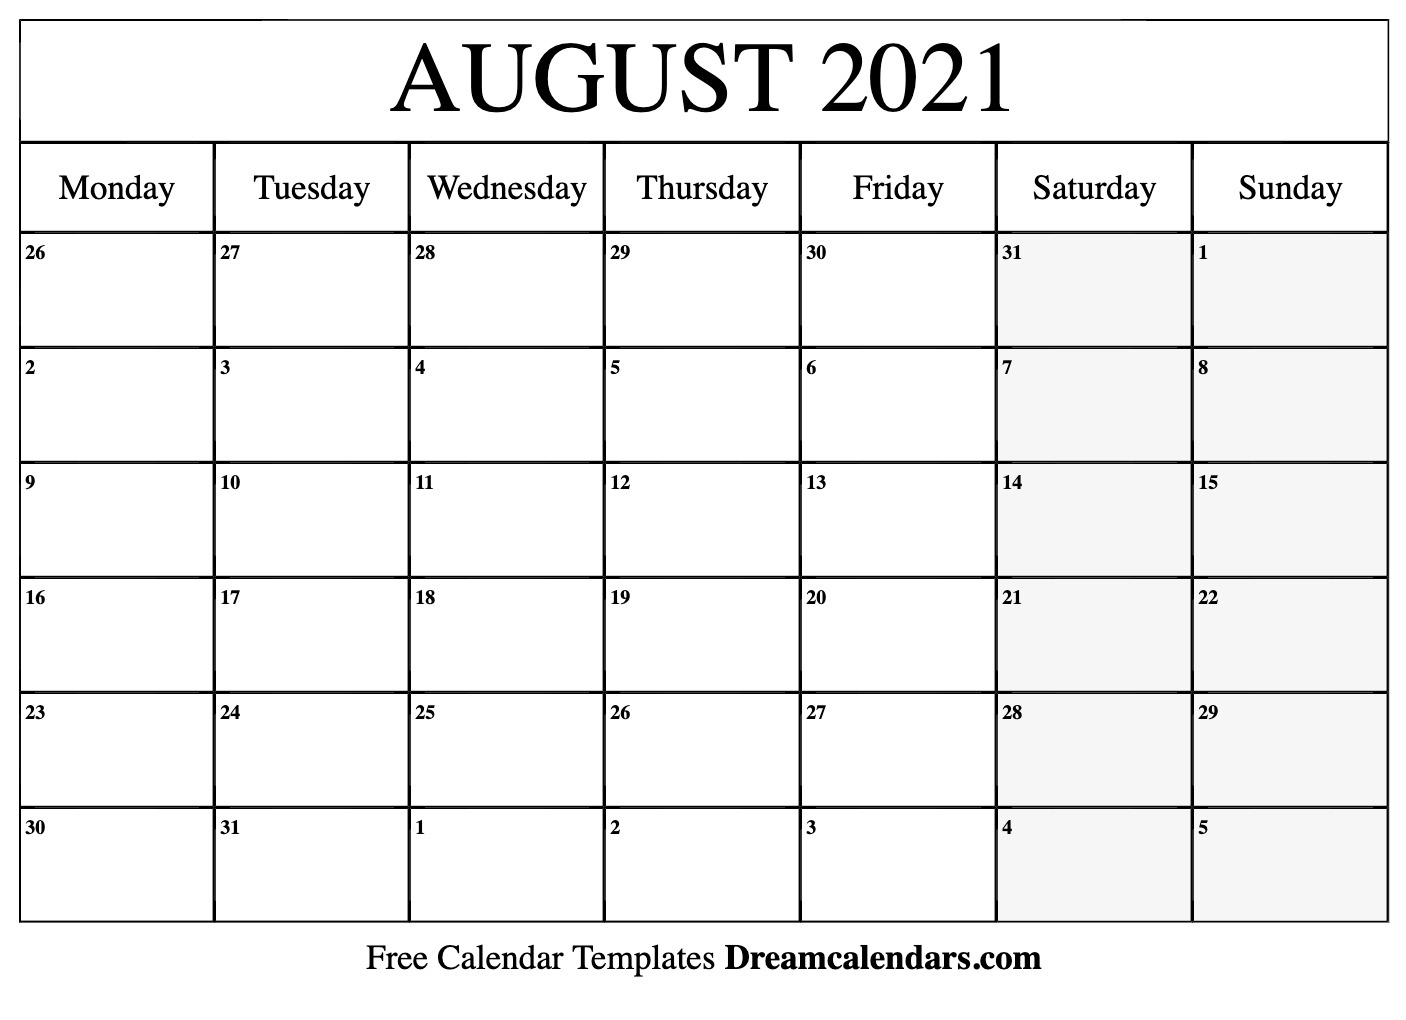 August 2021 Calendar | Free Blank Printable Templates Printable Calendar August 2020 To May 2021